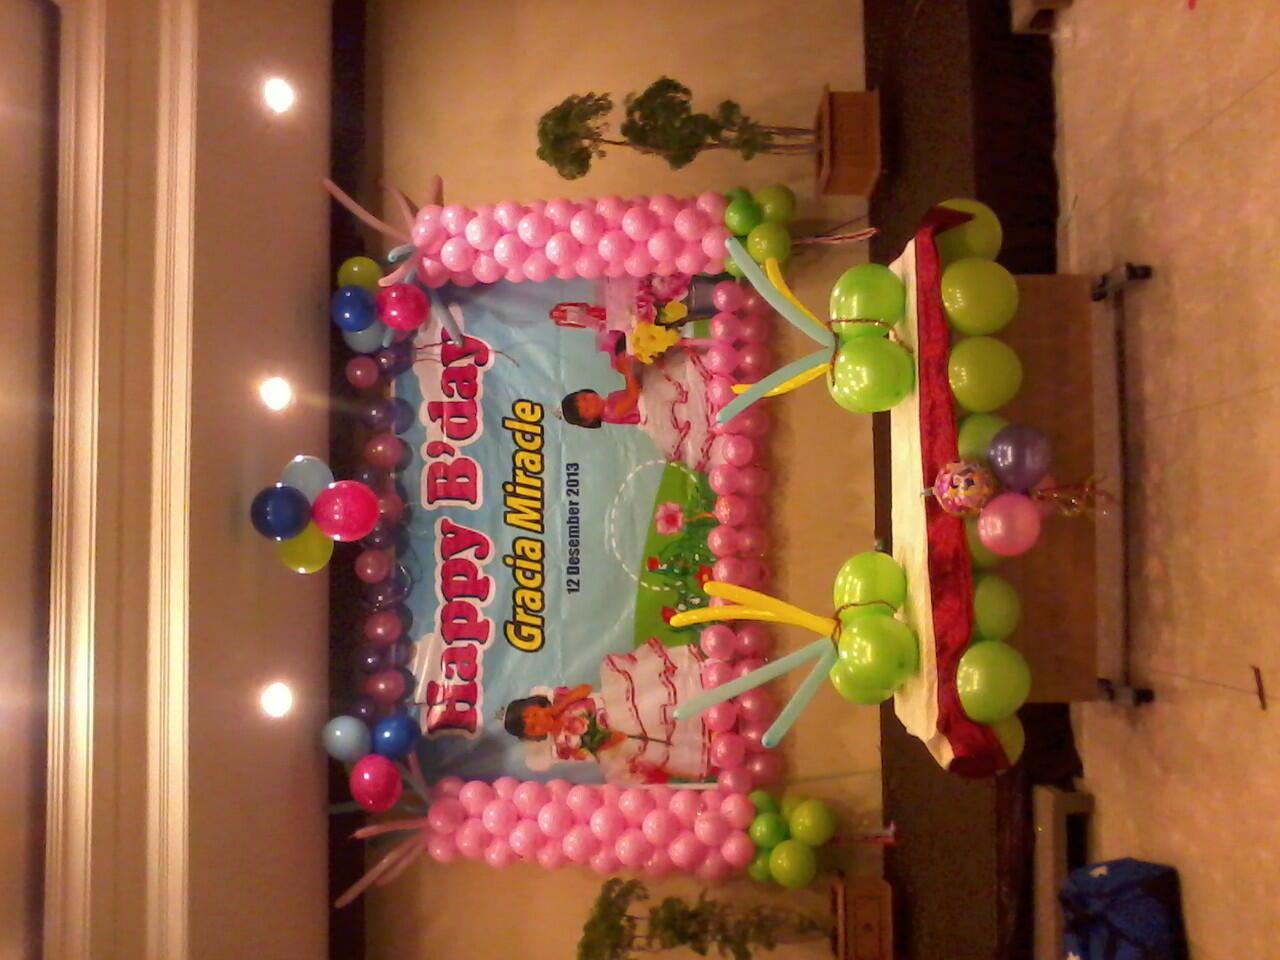 Jasa dekorasi balon di solo